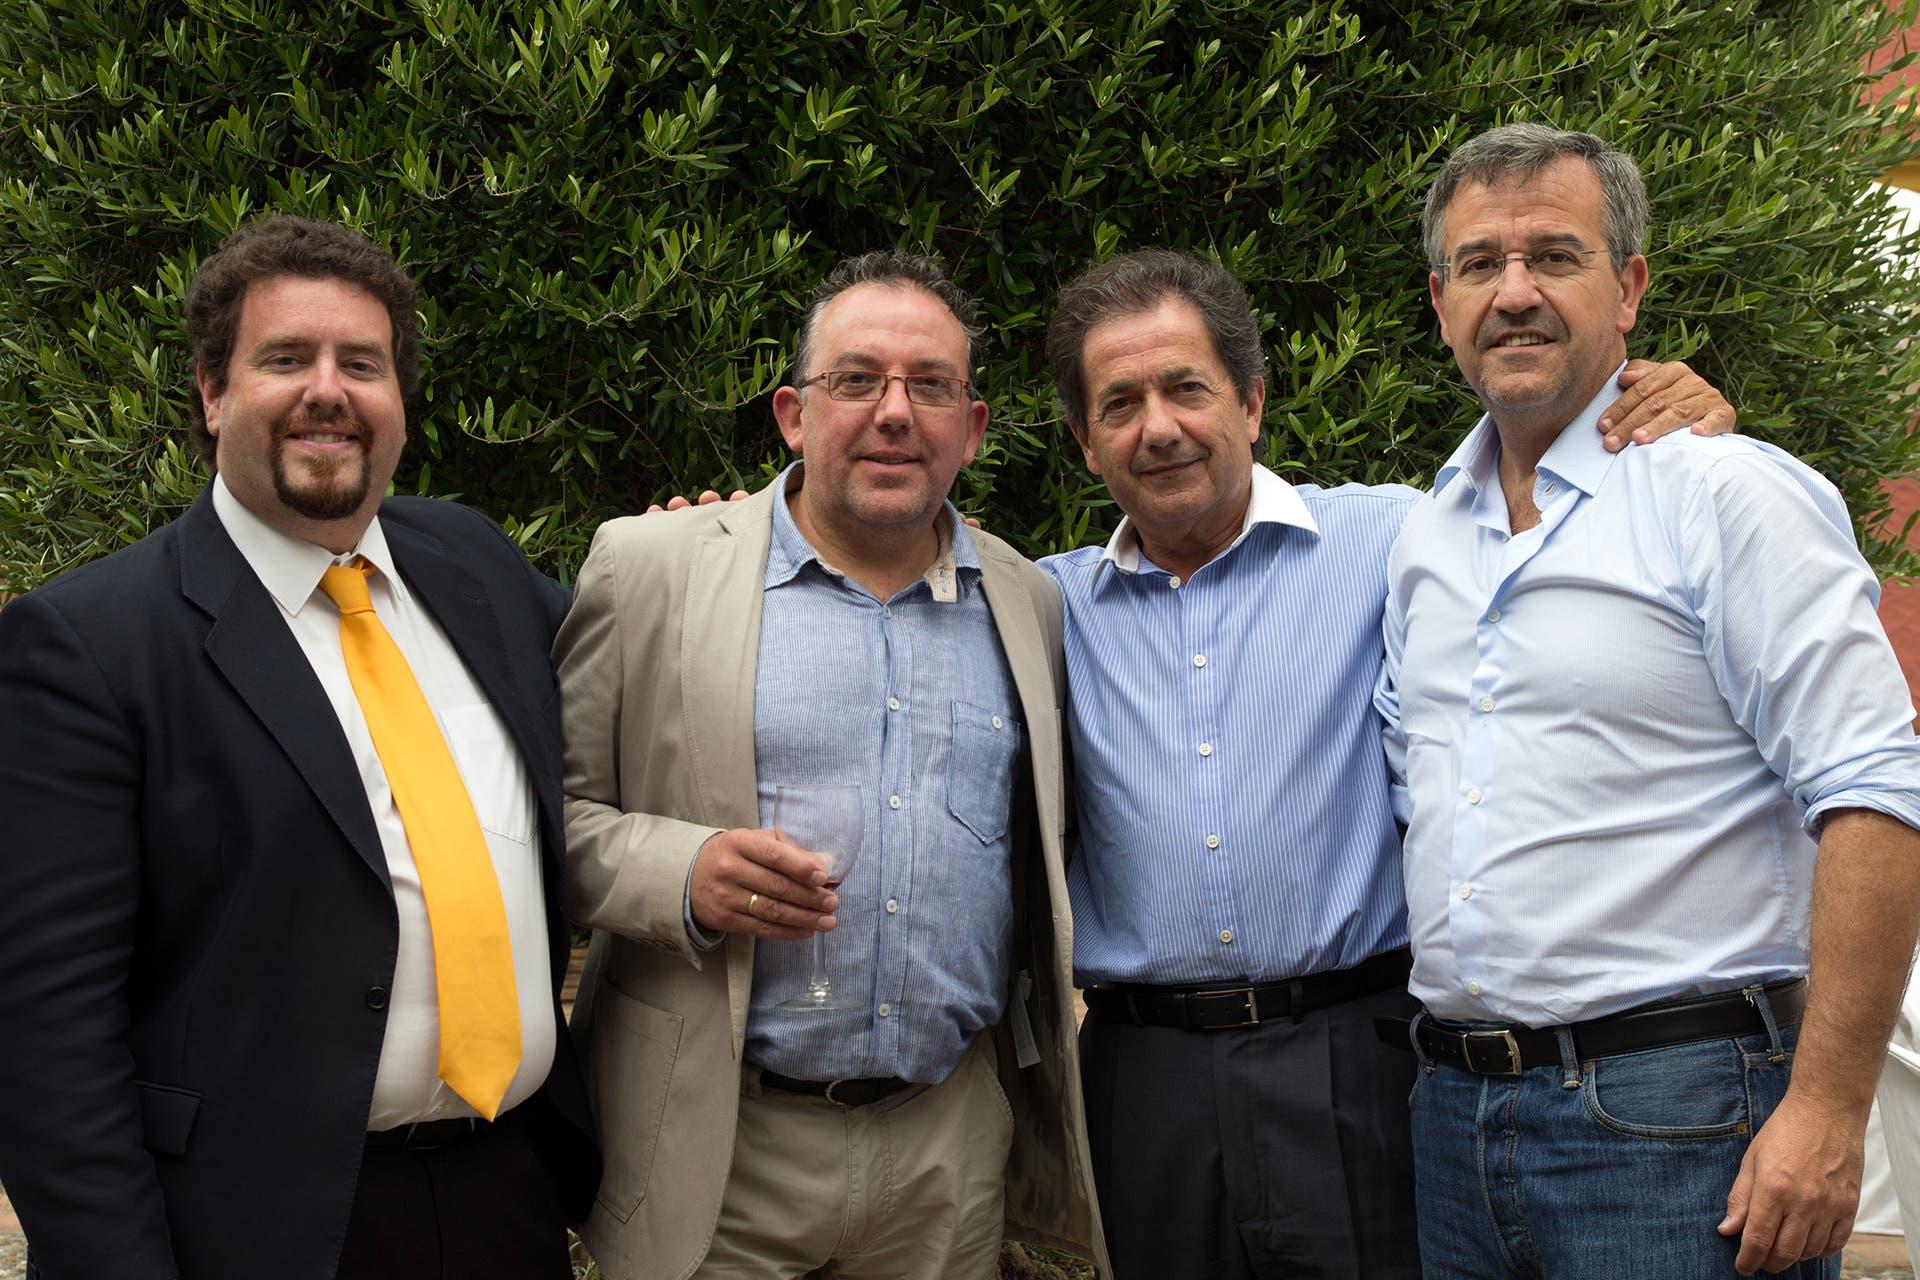 Mayors celebrate 10th birthday of Gaucin family hotel